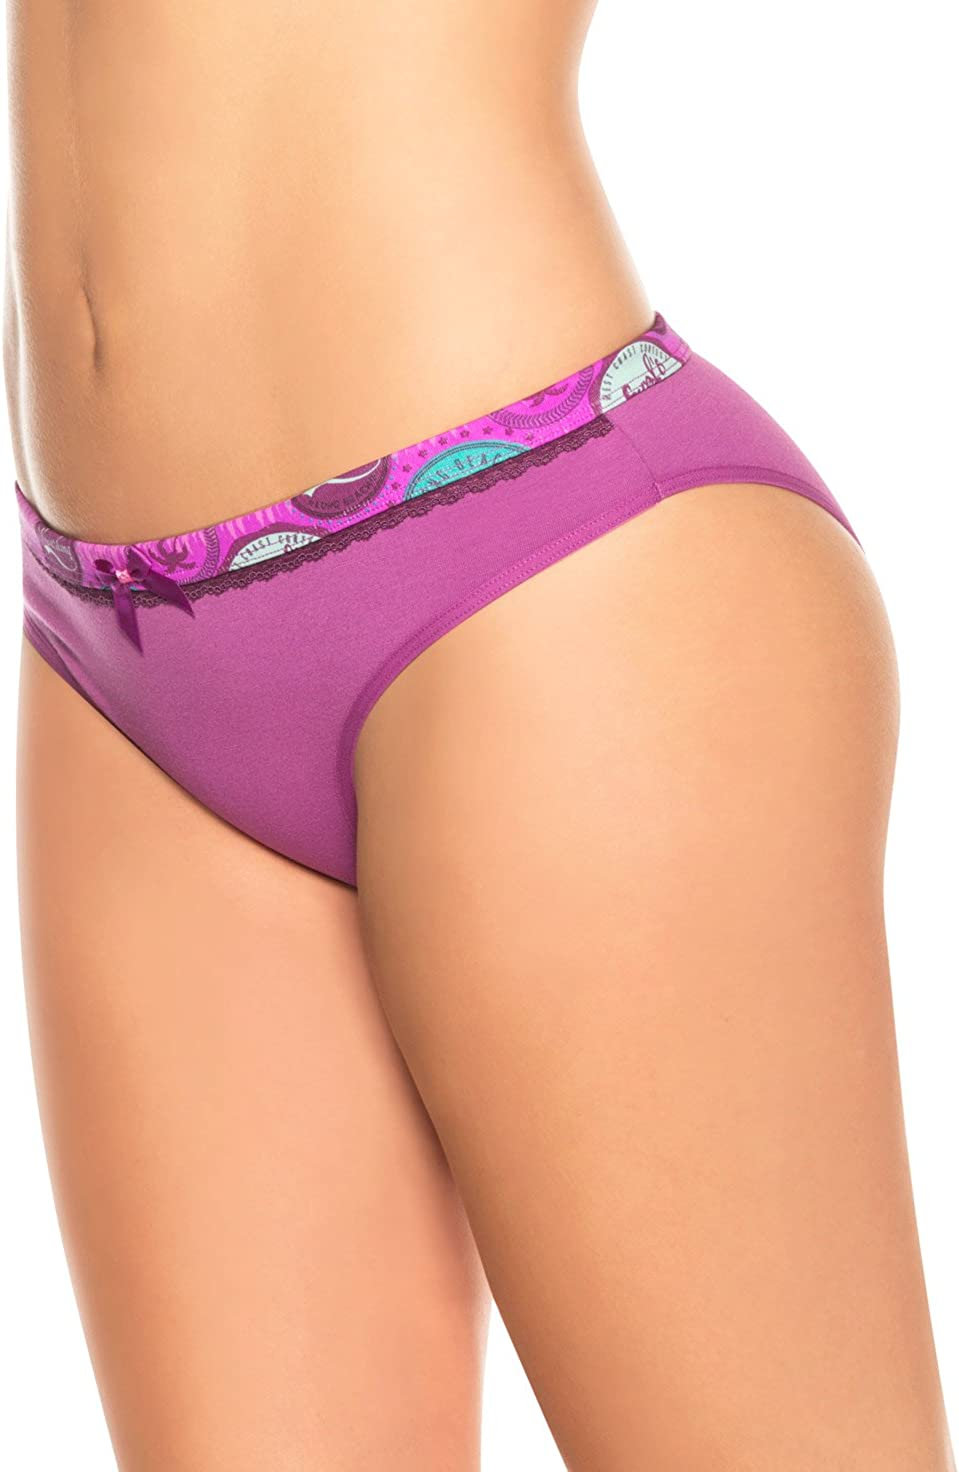 Laura Womens Bikini Cotton Underwear Waist Prints